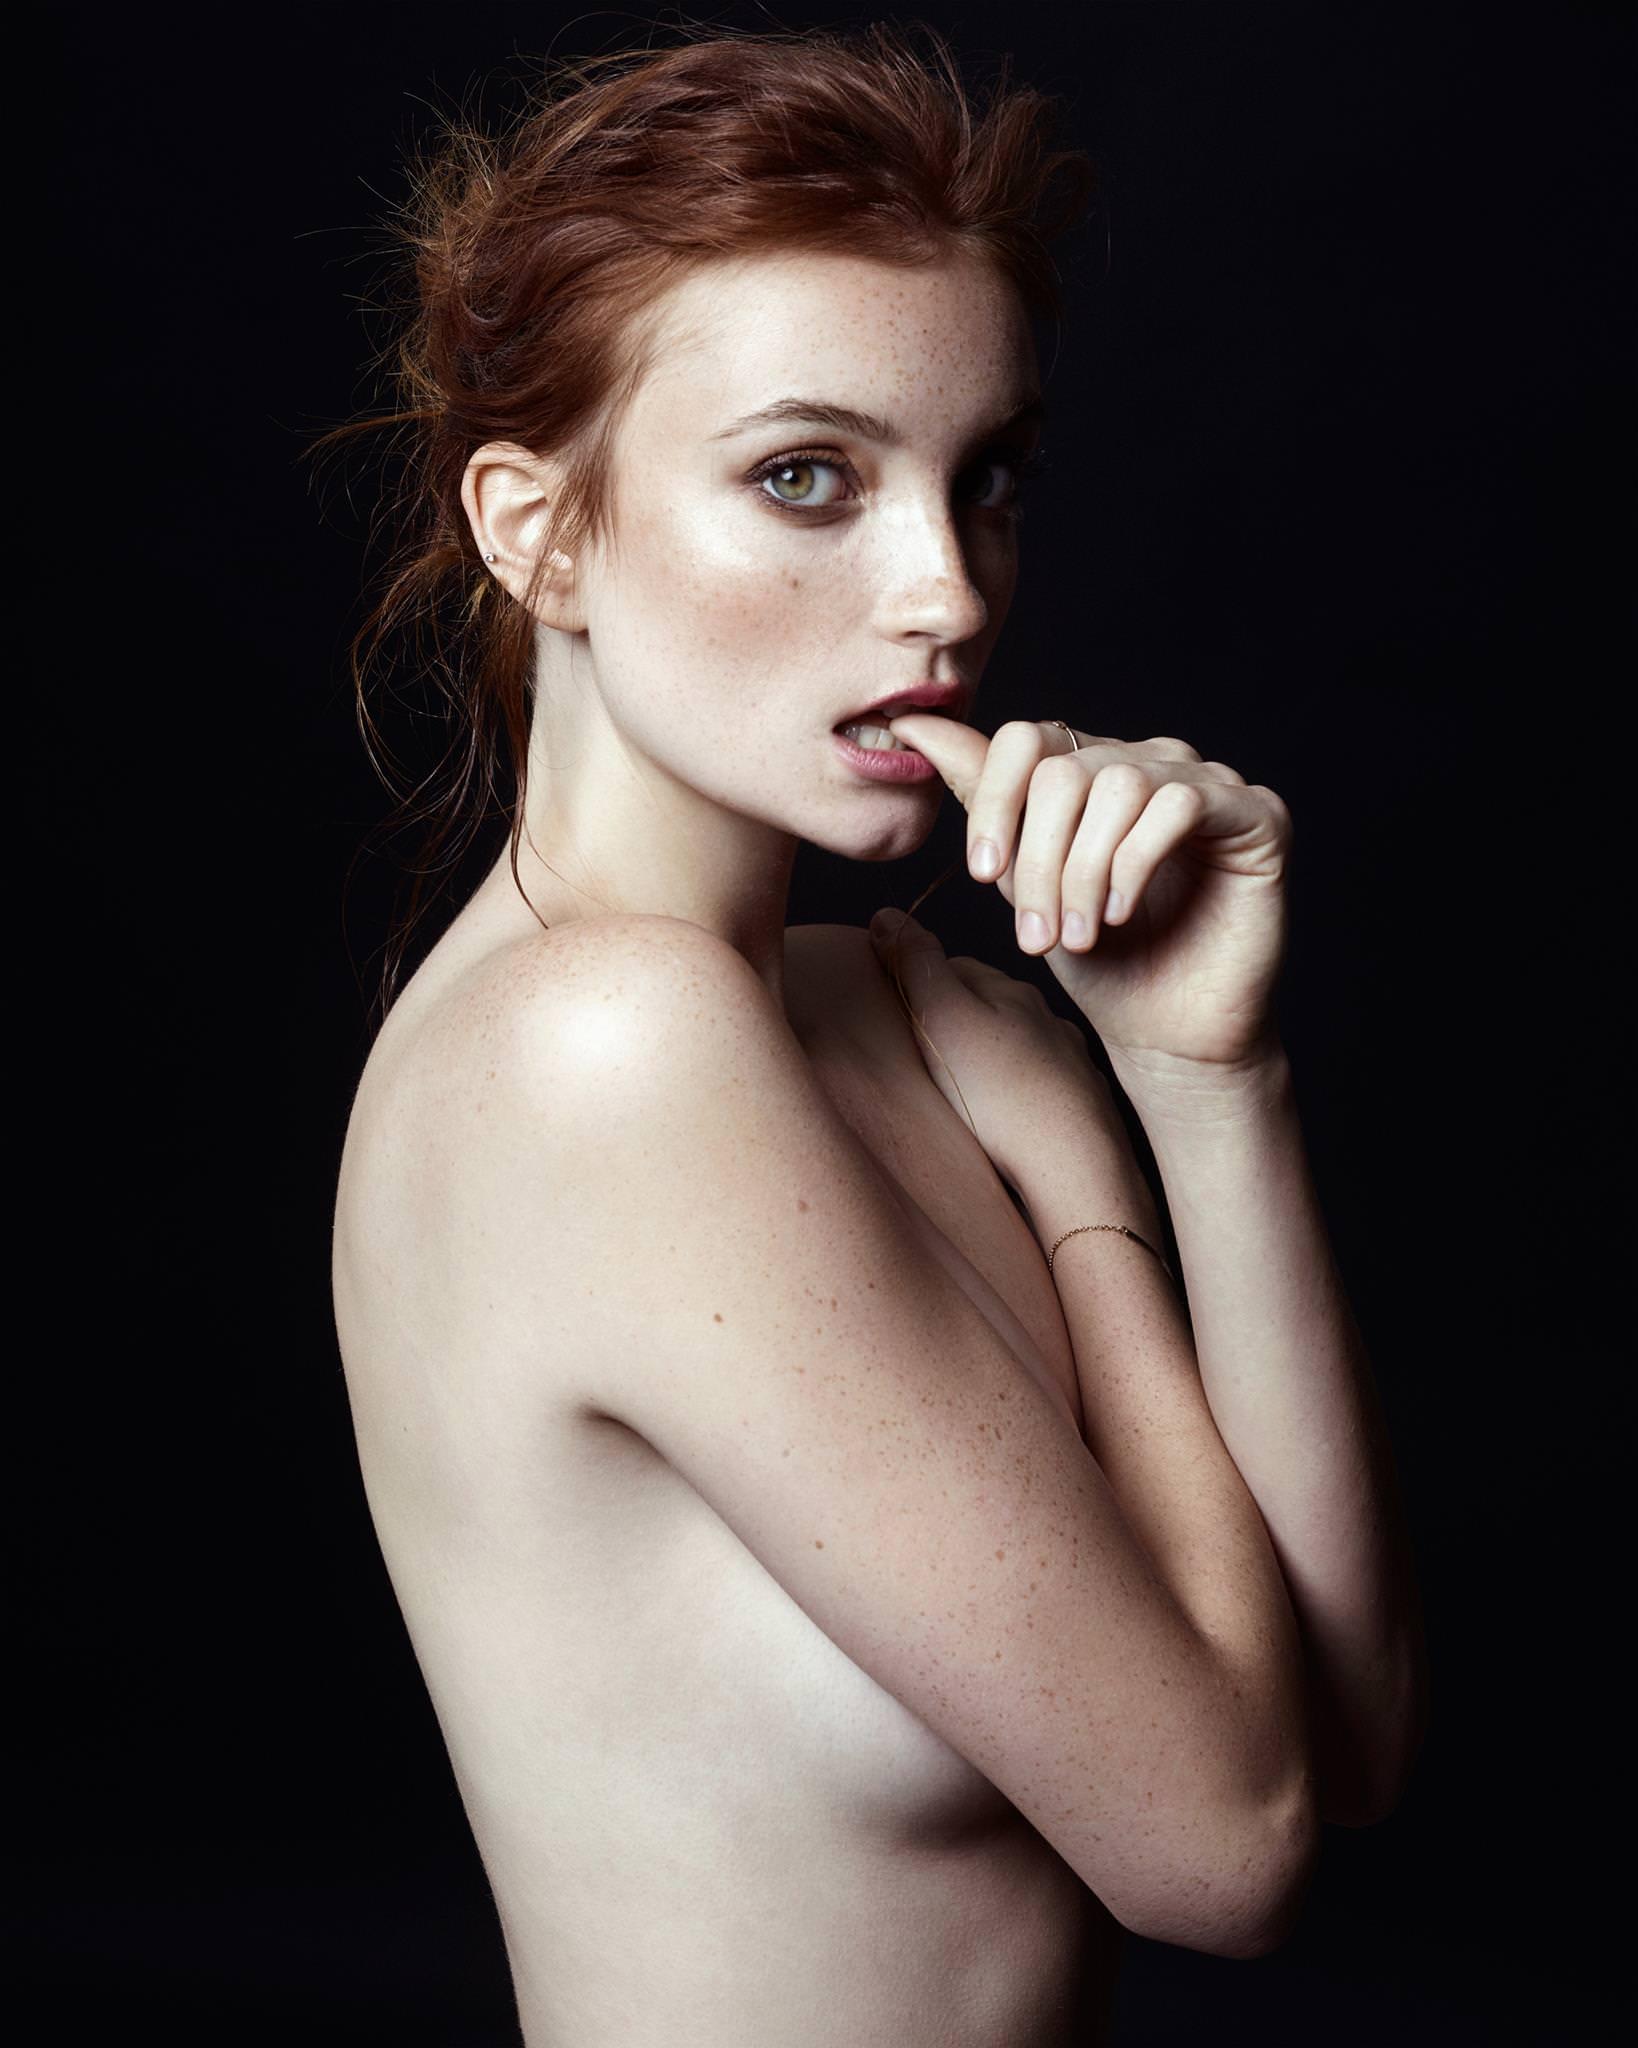 Tits Snapchat Kendall Nicole Jenner naked photo 2017